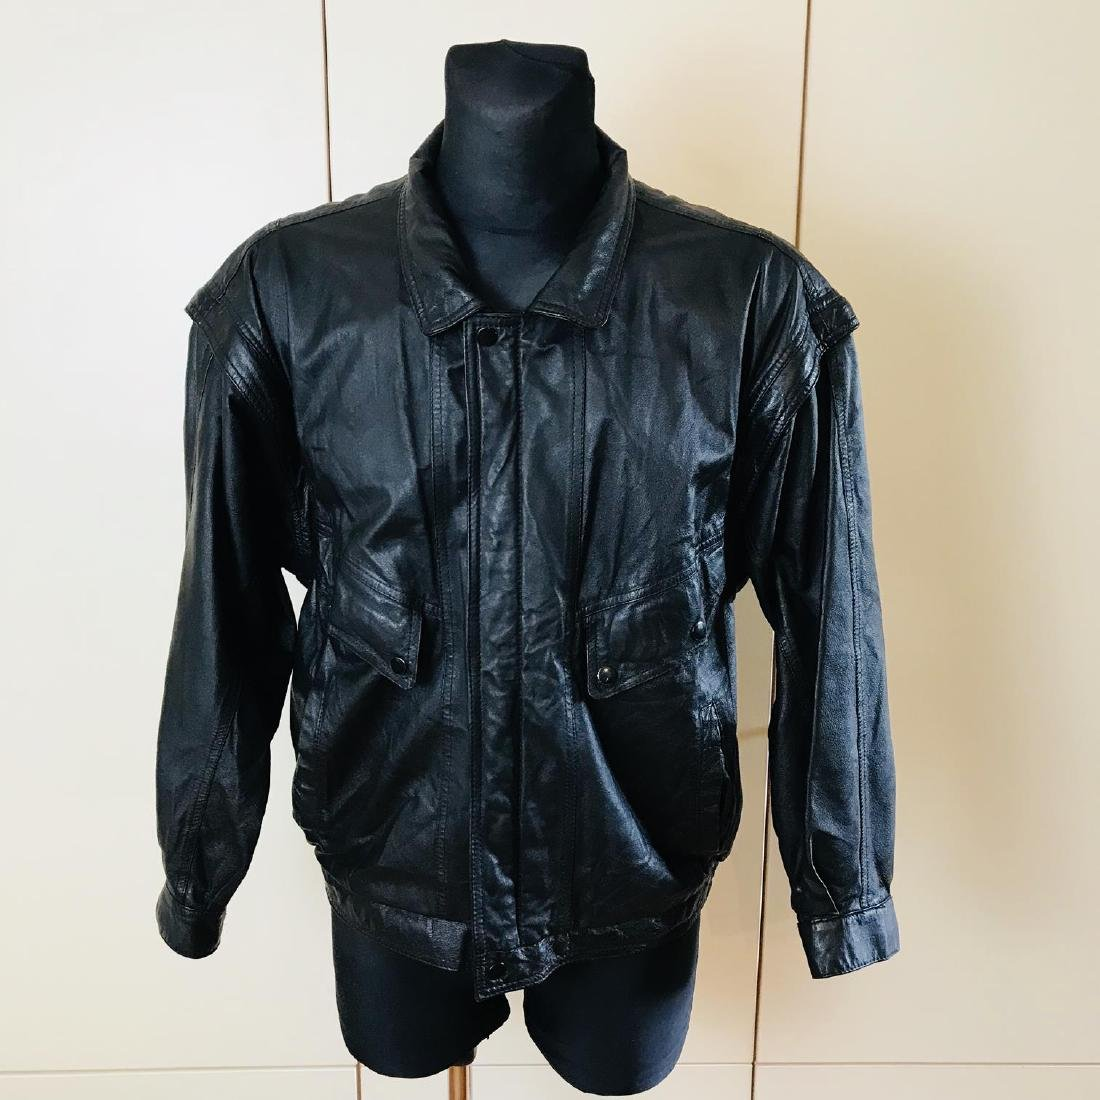 Vintage Men's Boecker Leather Jacket Size US 42